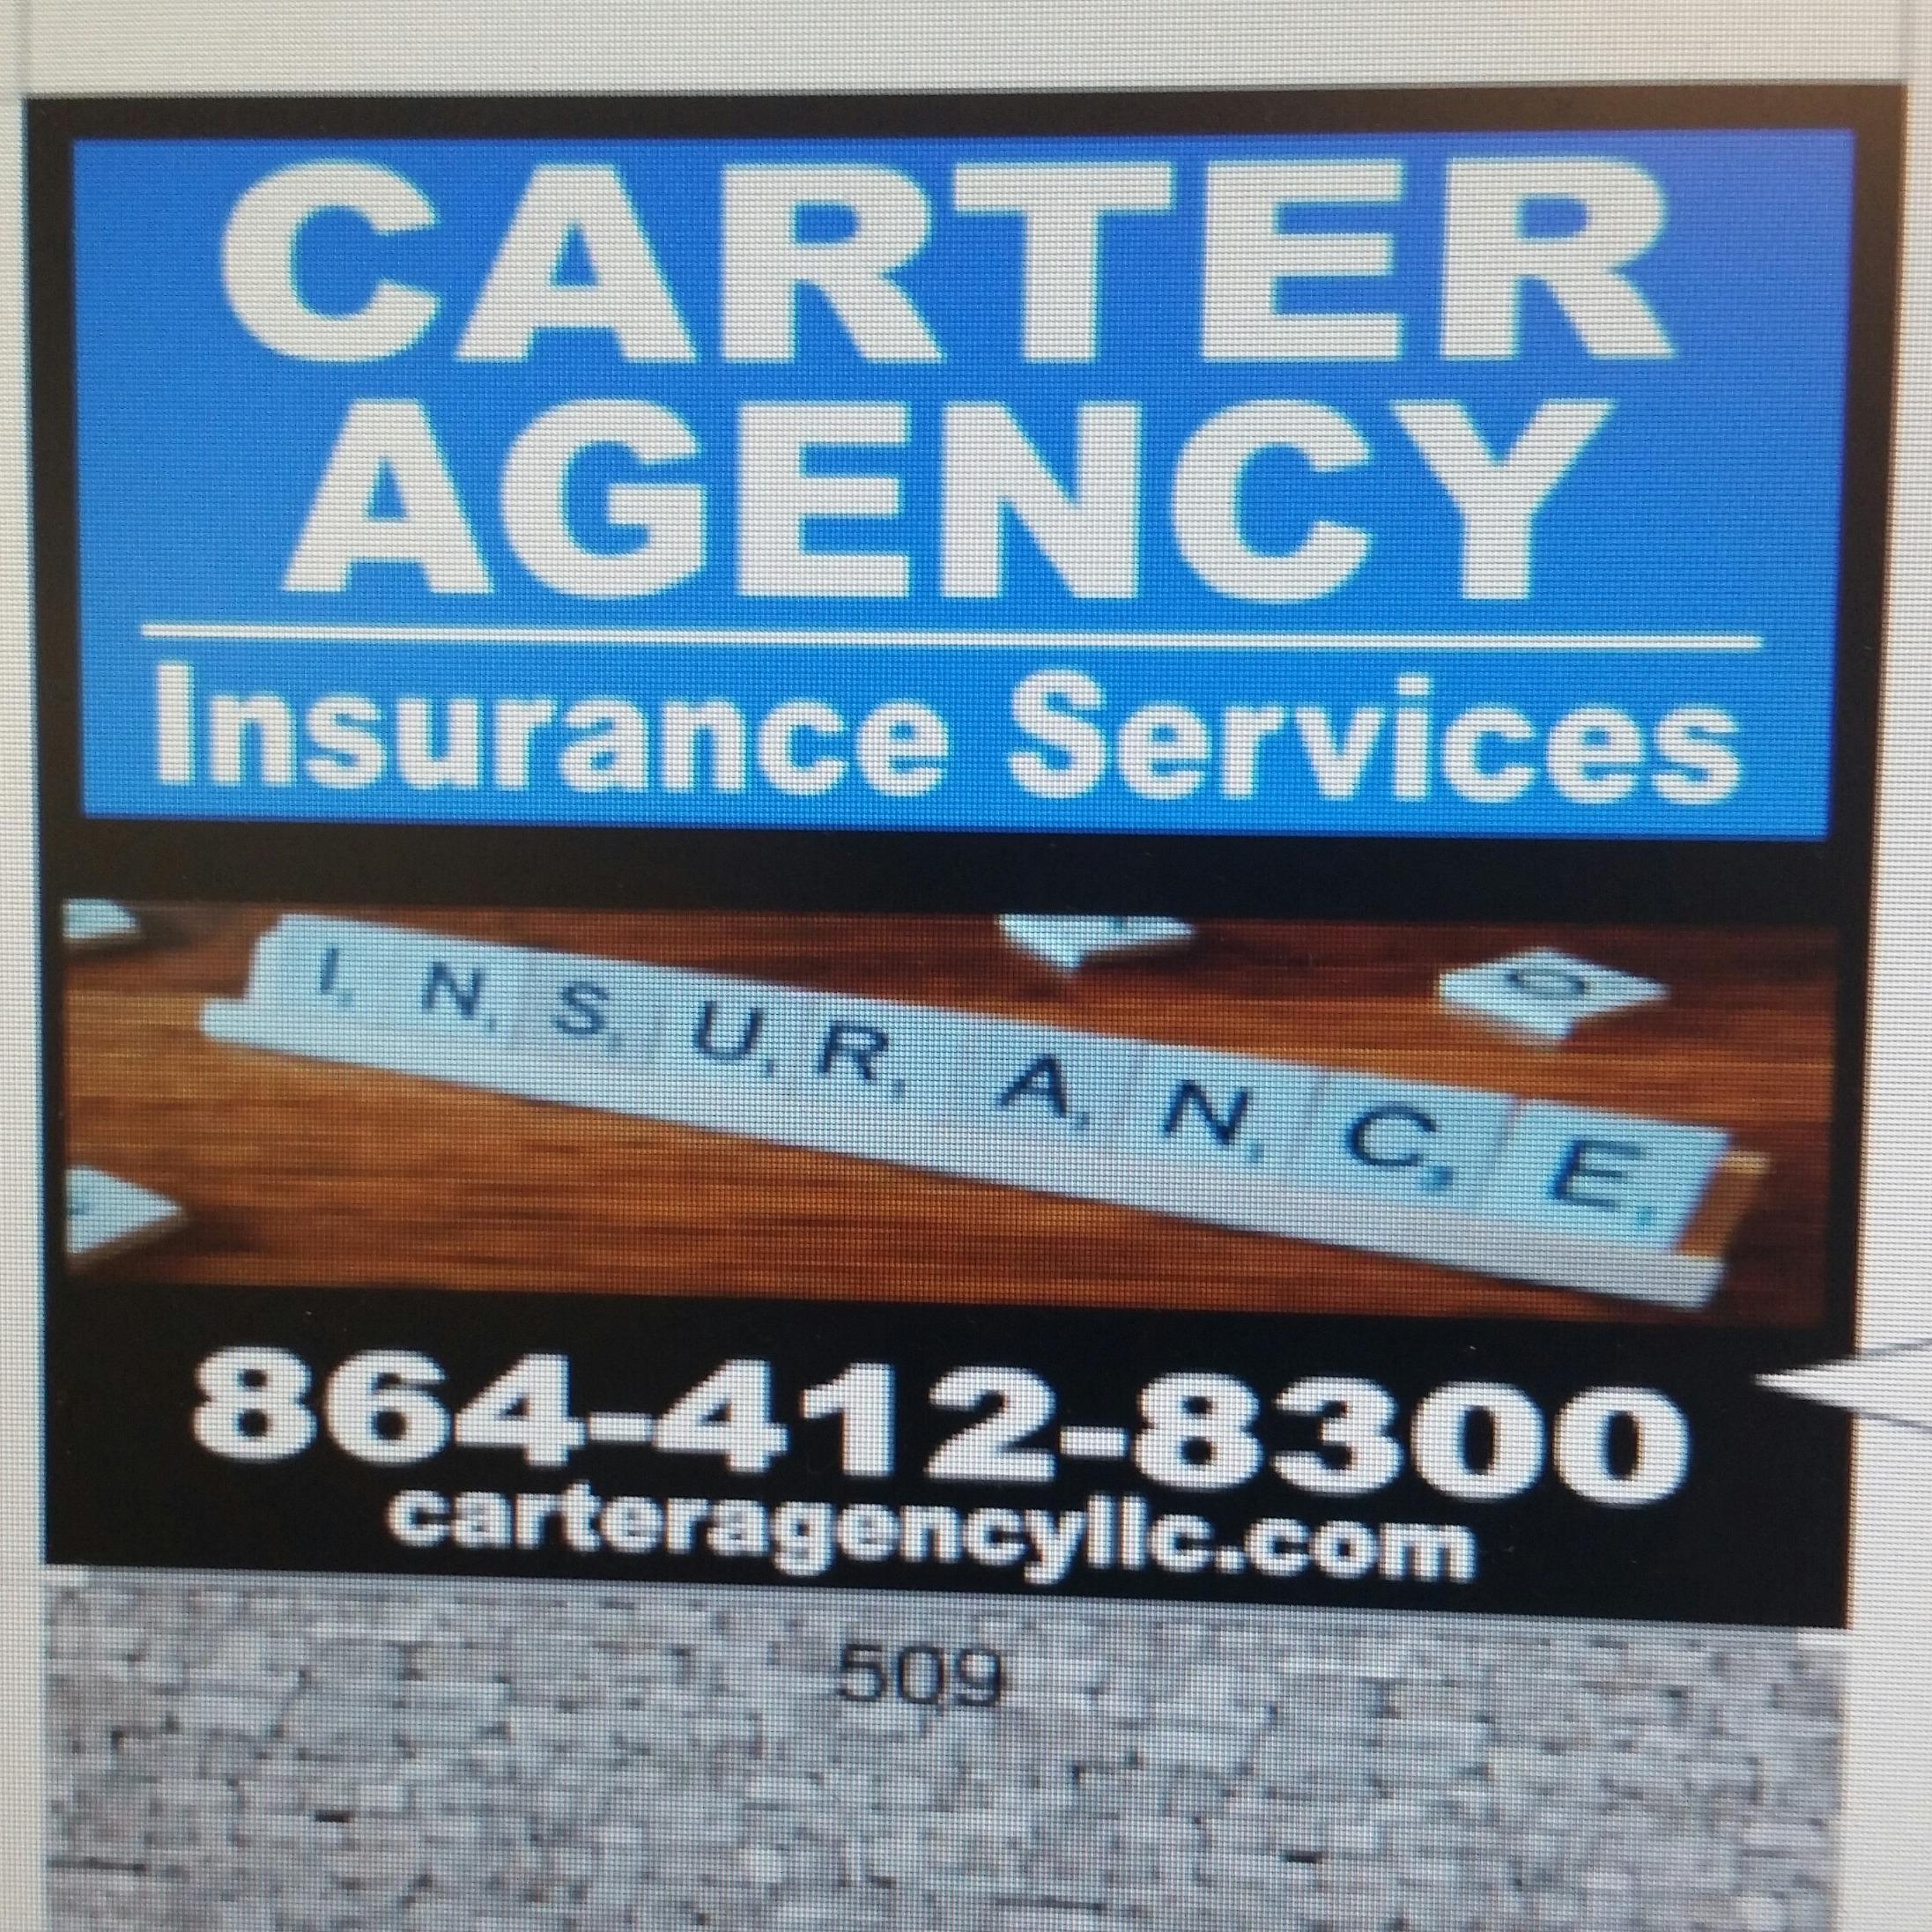 Life Insurance Agency in SC MAULDIN 29662 CARTER AGENCY INSURANCE SERVICES 509 N. MAIN STREET  (864)412-8300